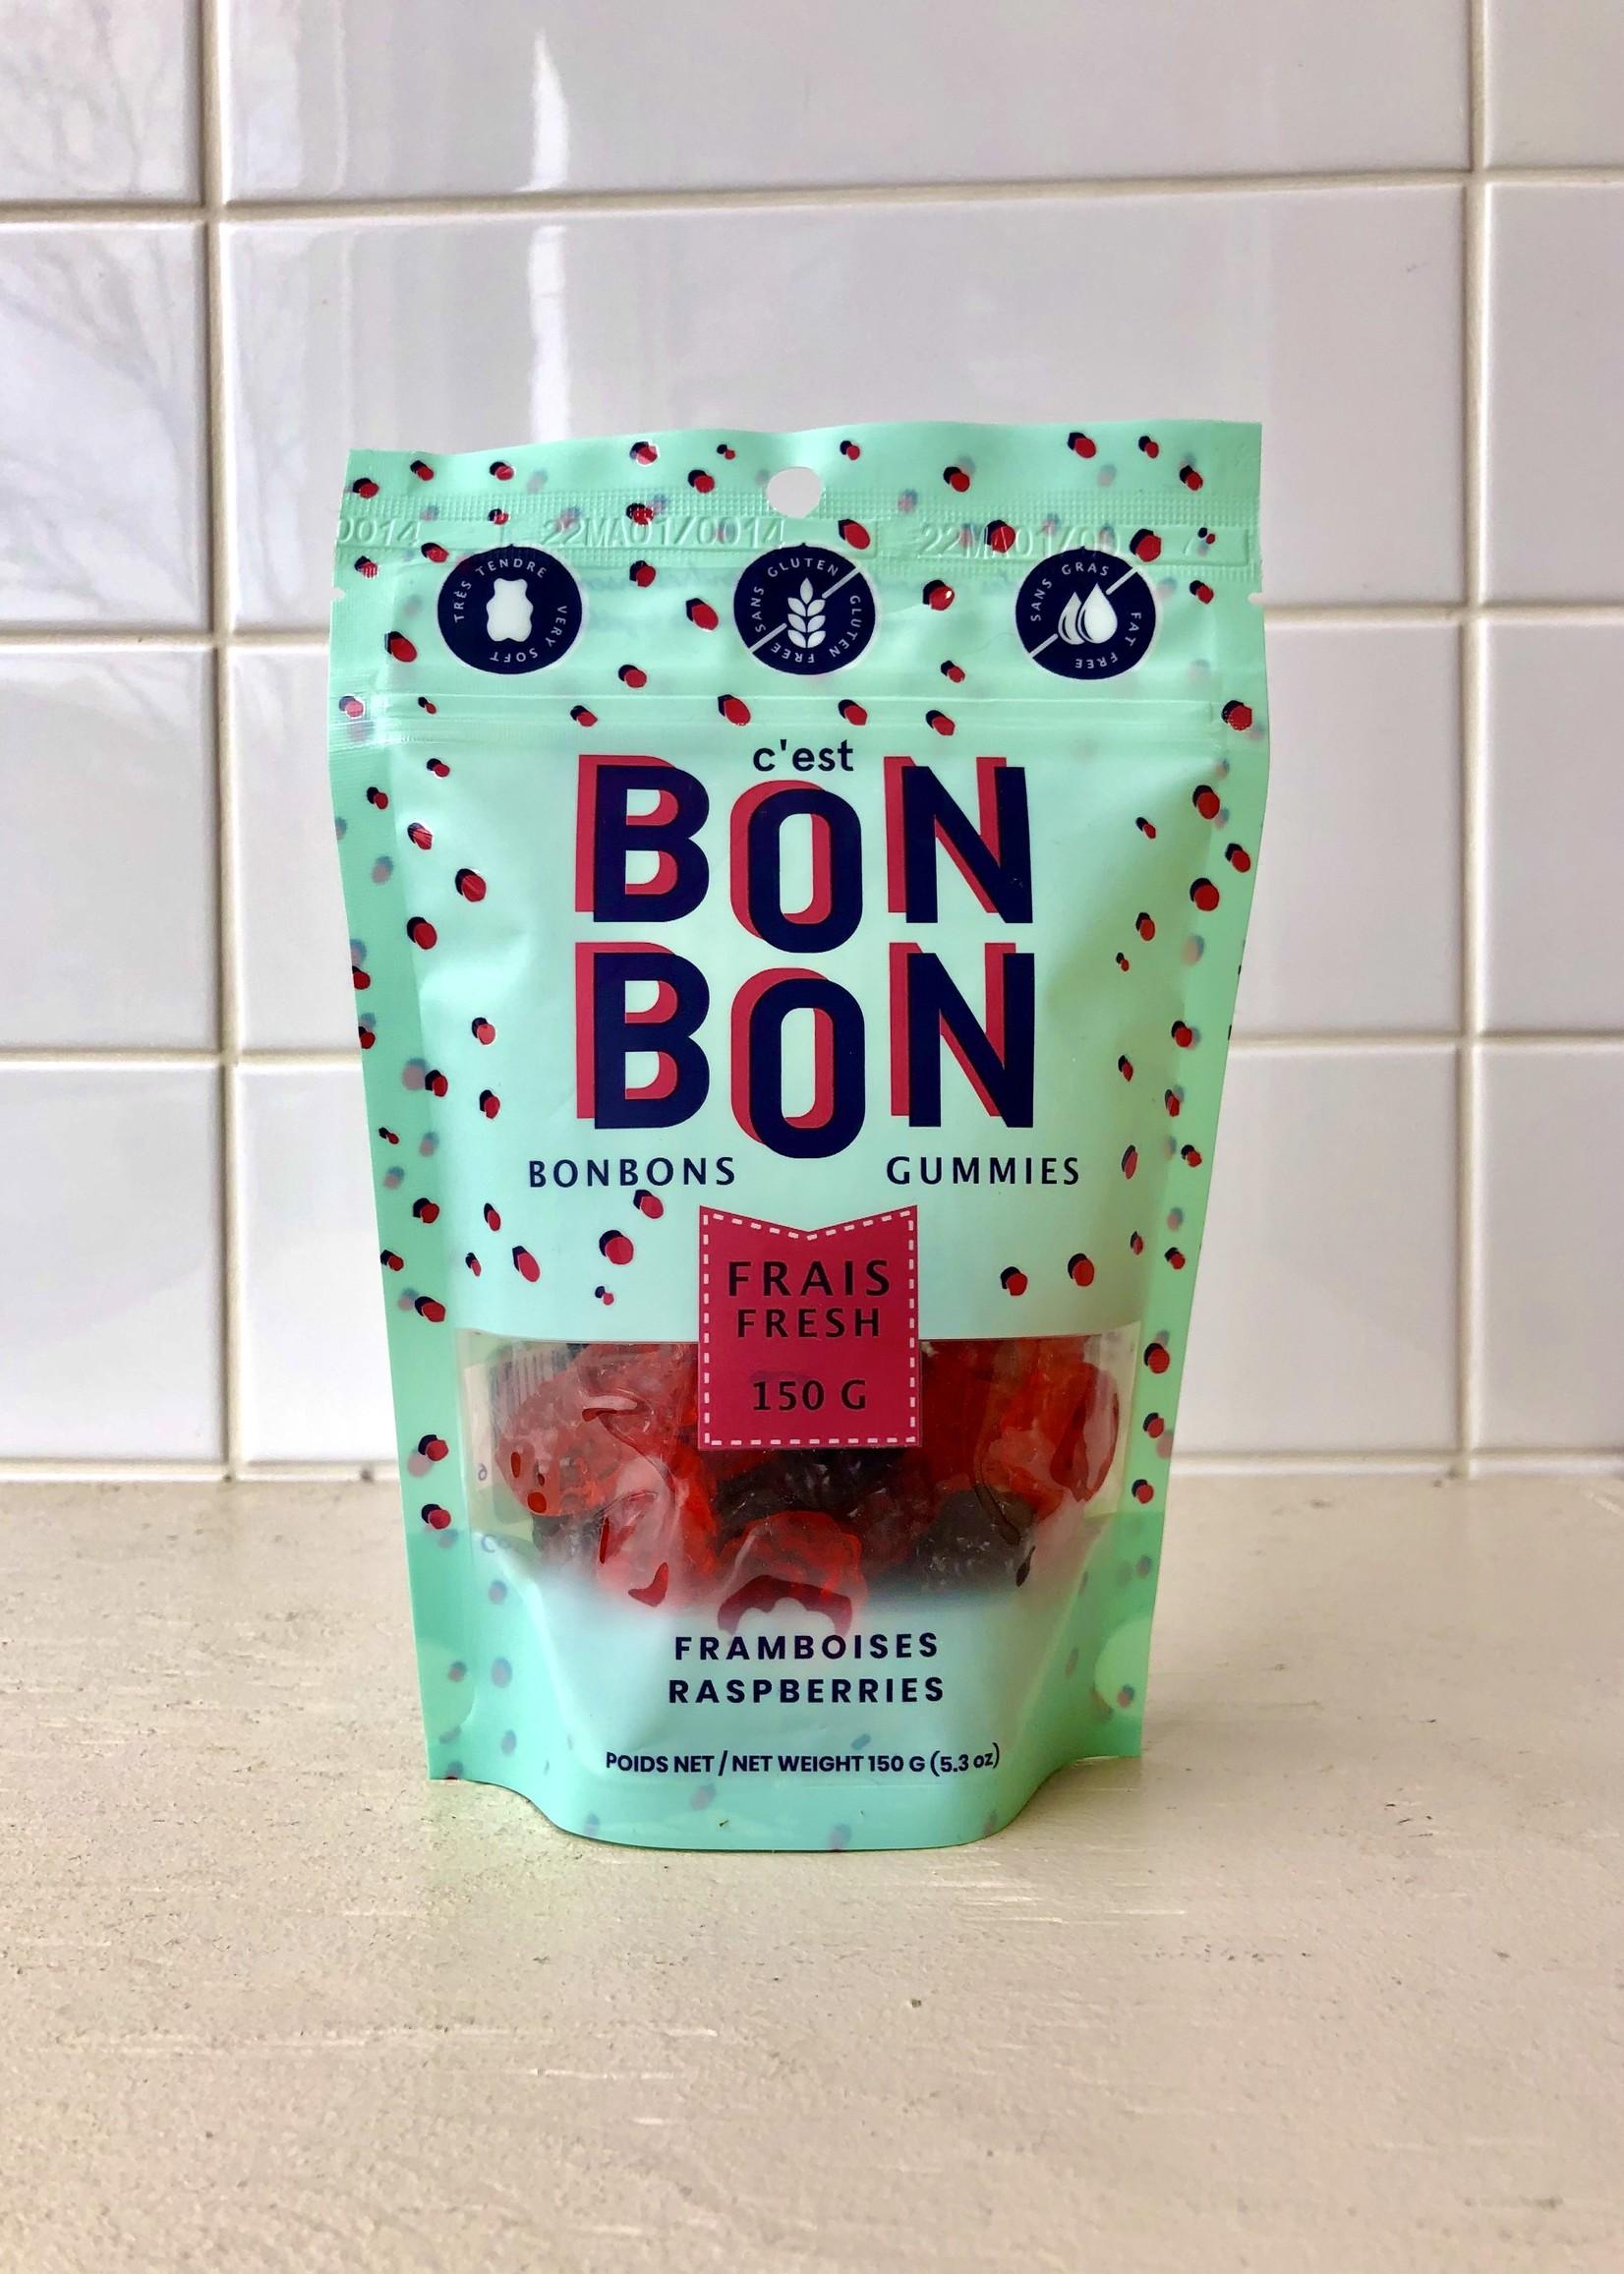 C'est Bon Bon Bonbons mélangés